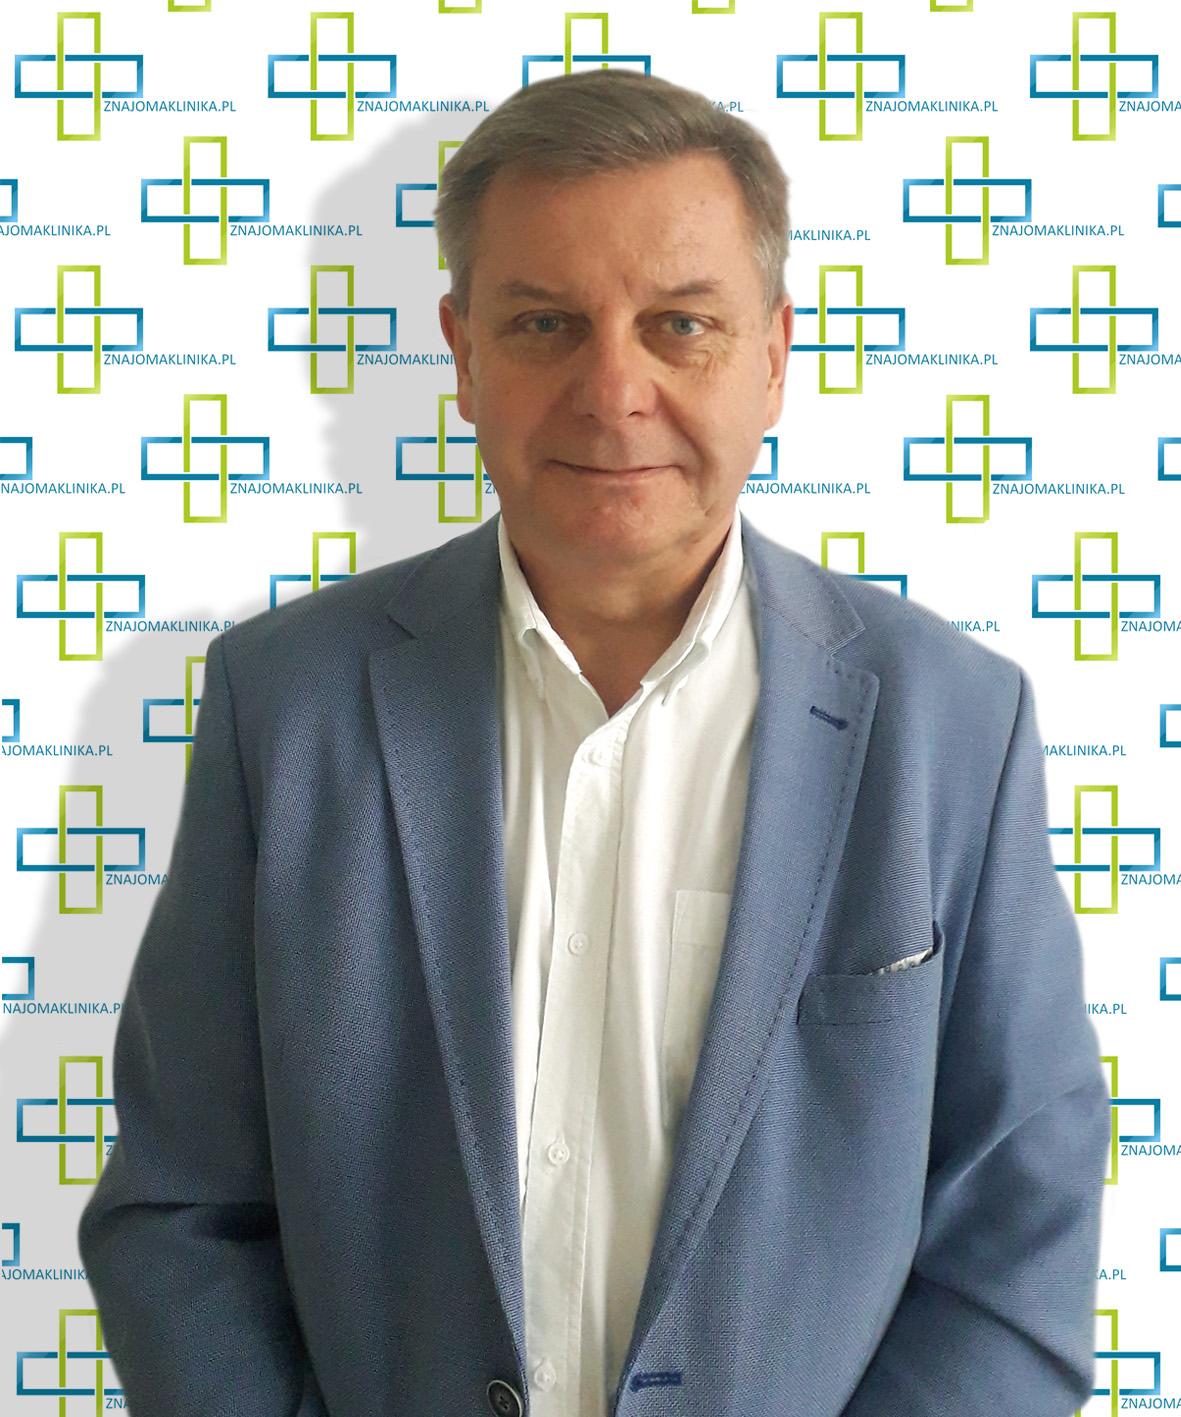 dr n.med. Bohdan Dąbrowski